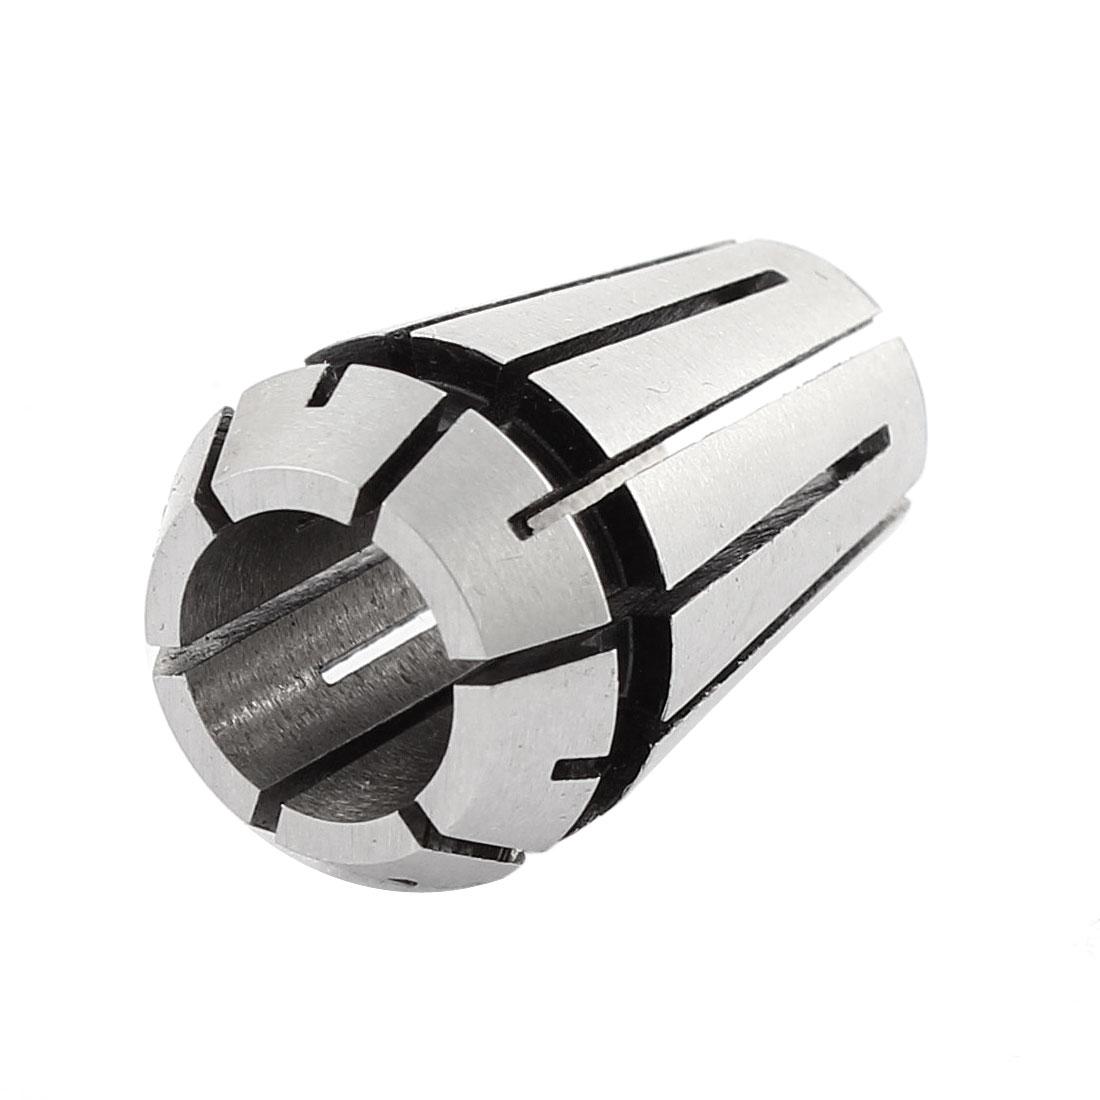 ER16 10mm Clamping Range Slotted Spring Collet Adapter CNC Milling Lathe Tool Bit Holder